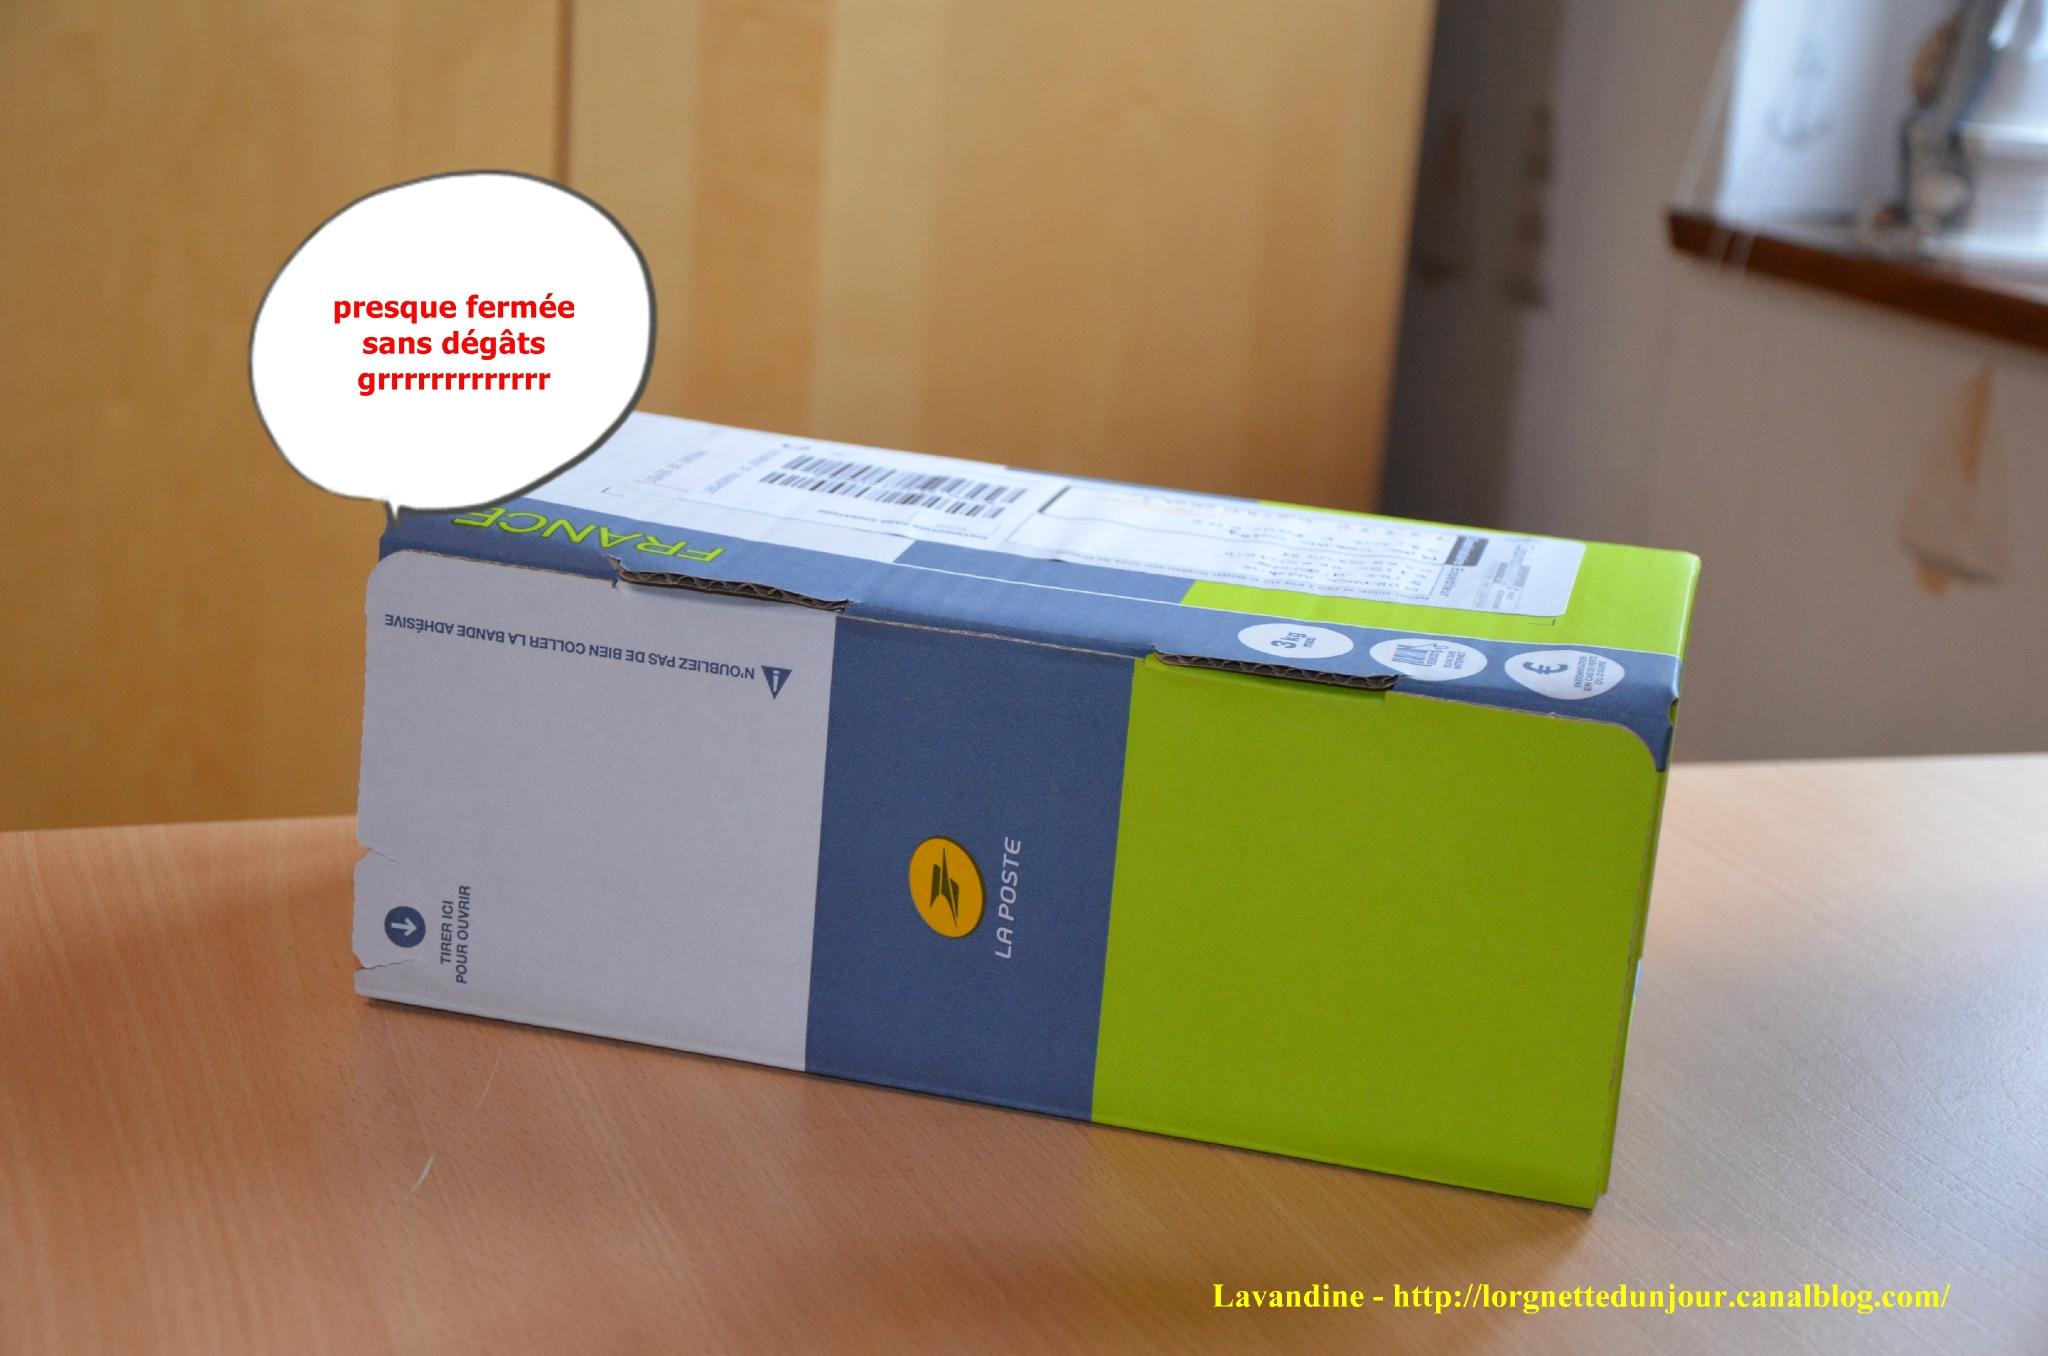 31/07/14 : Comment monter une boite ?